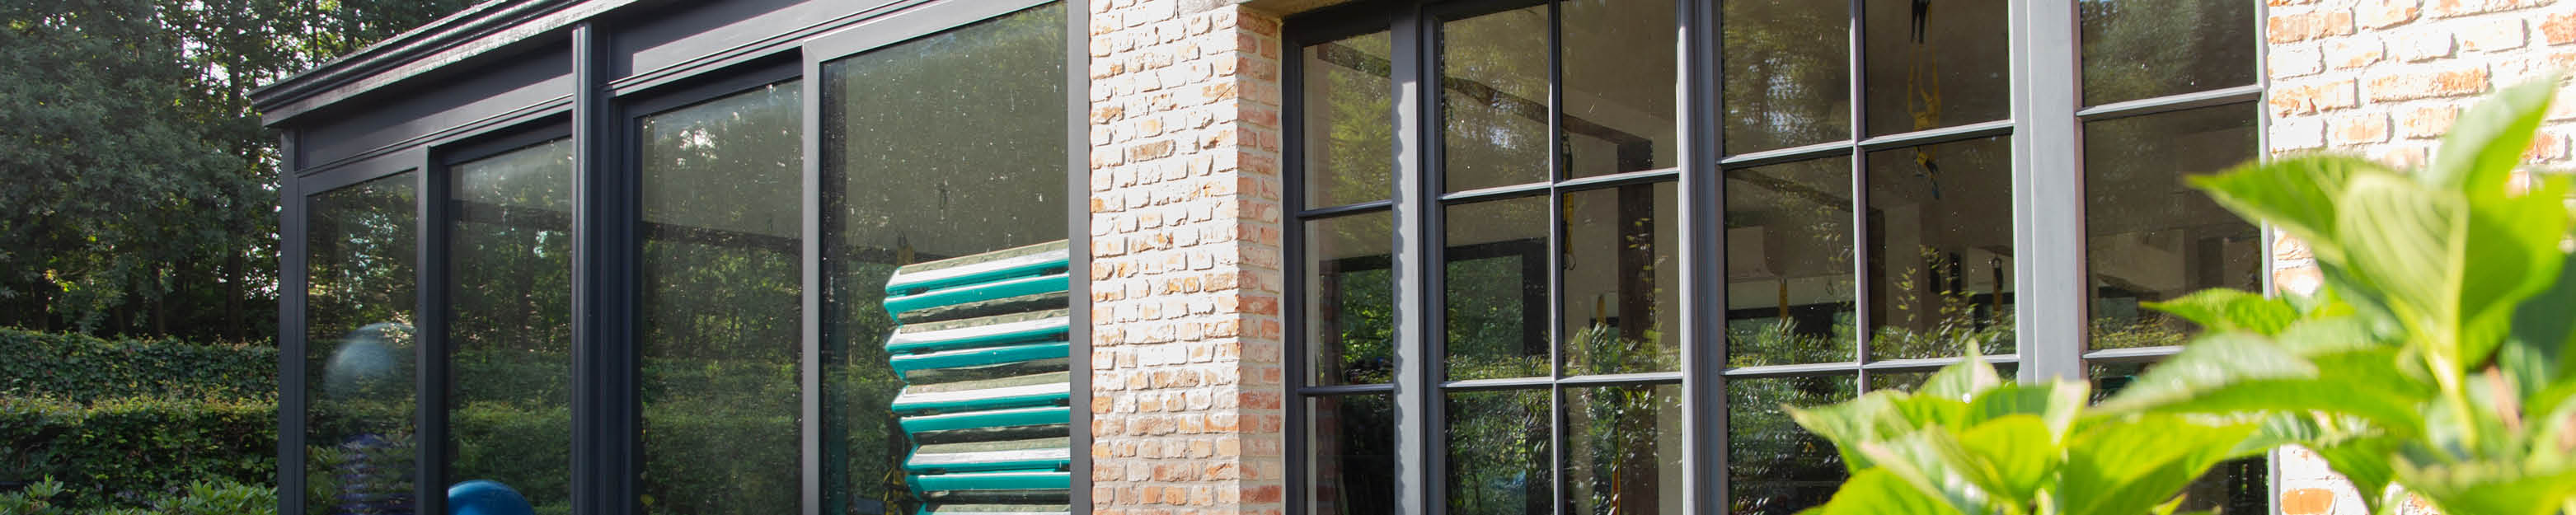 Moderne veranda met fitnessstudio